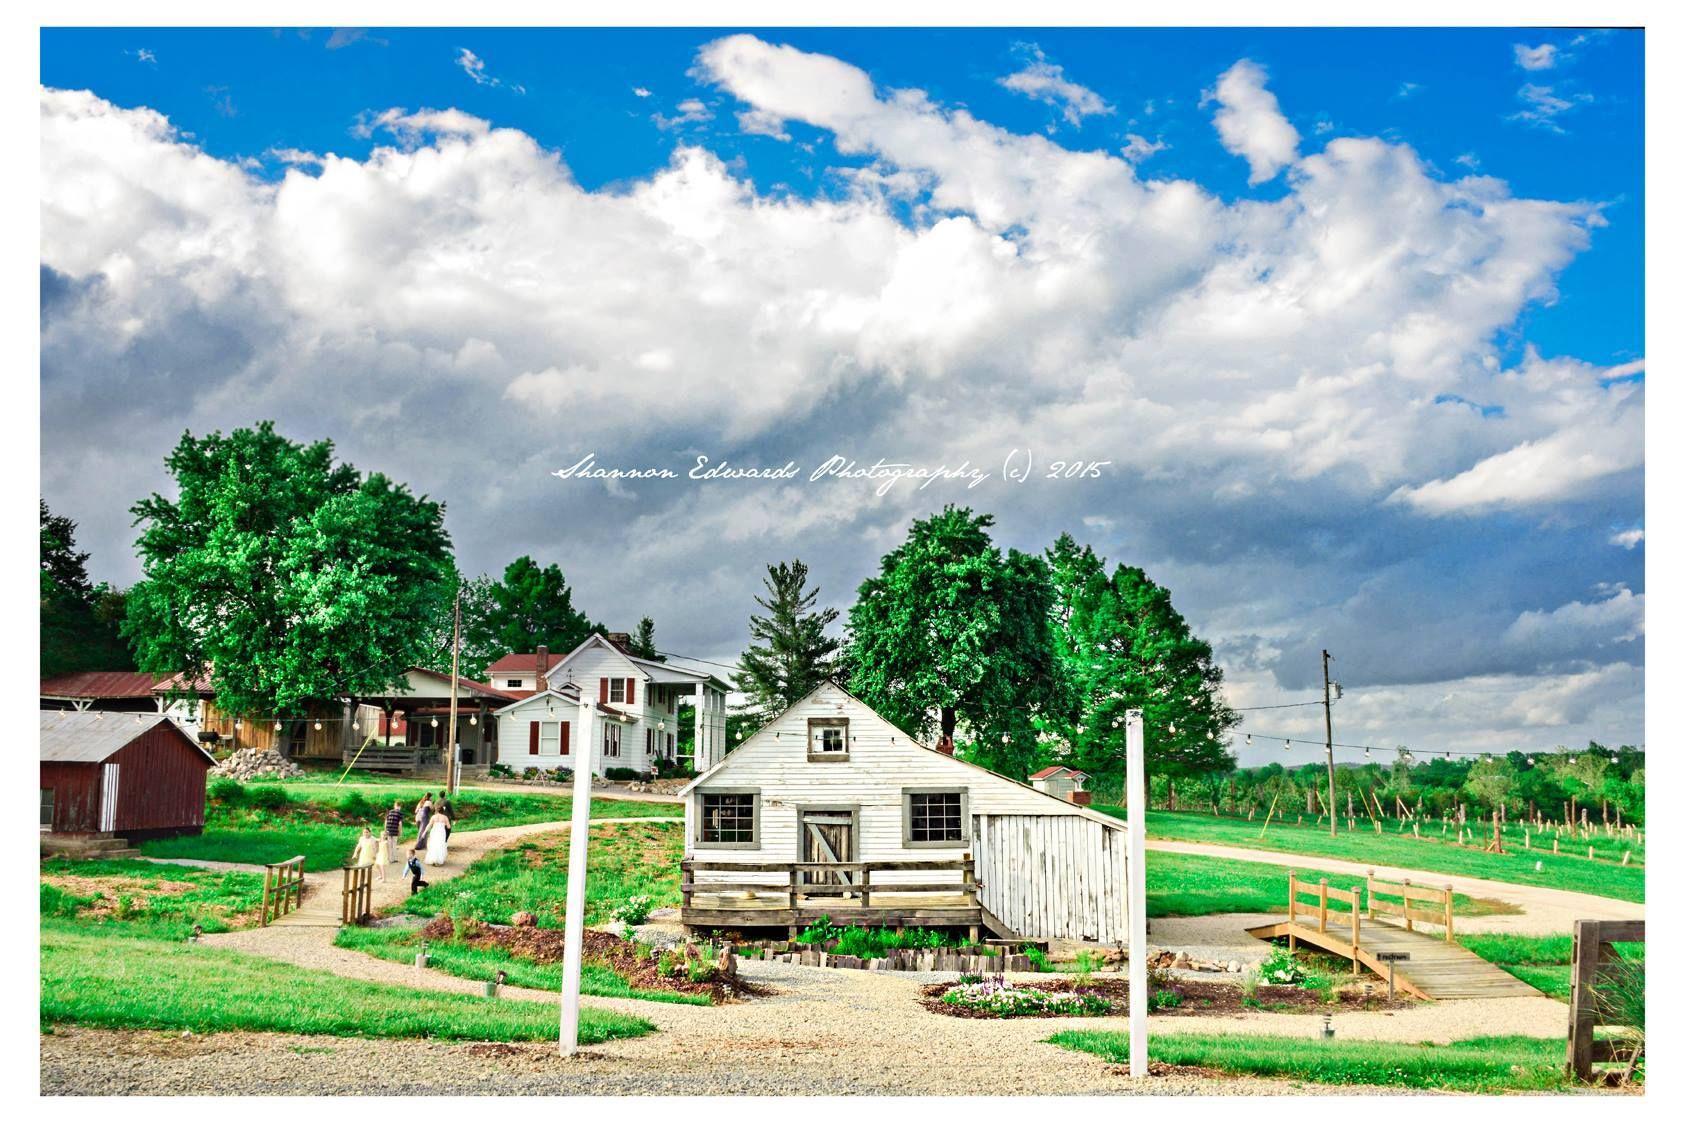 Historic missouri barn wedding venue just south of st